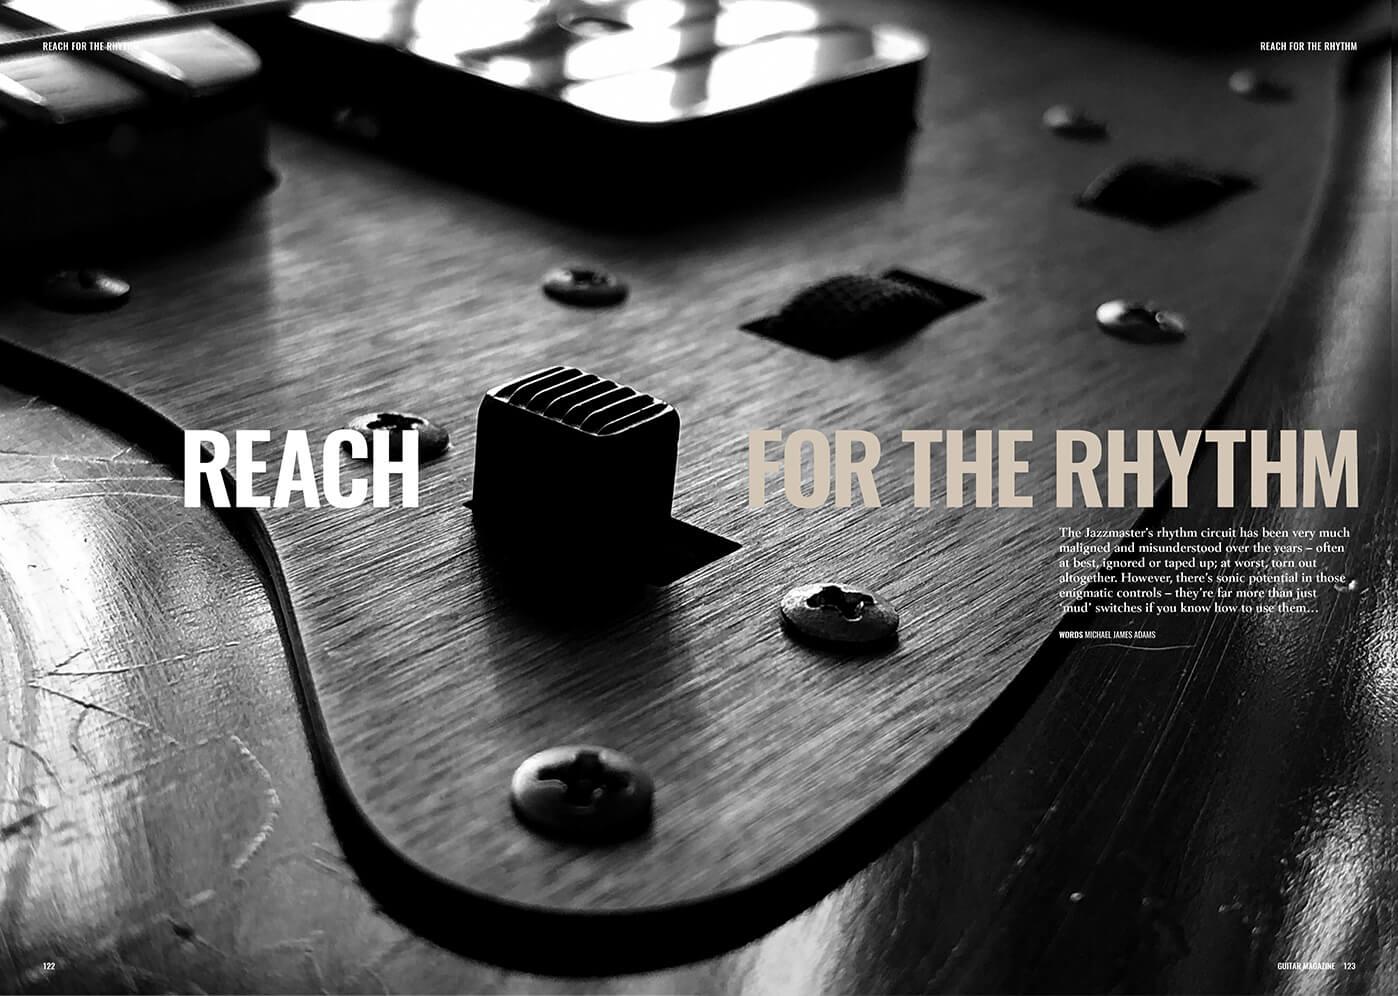 fender jazzmaster rhythm circuit